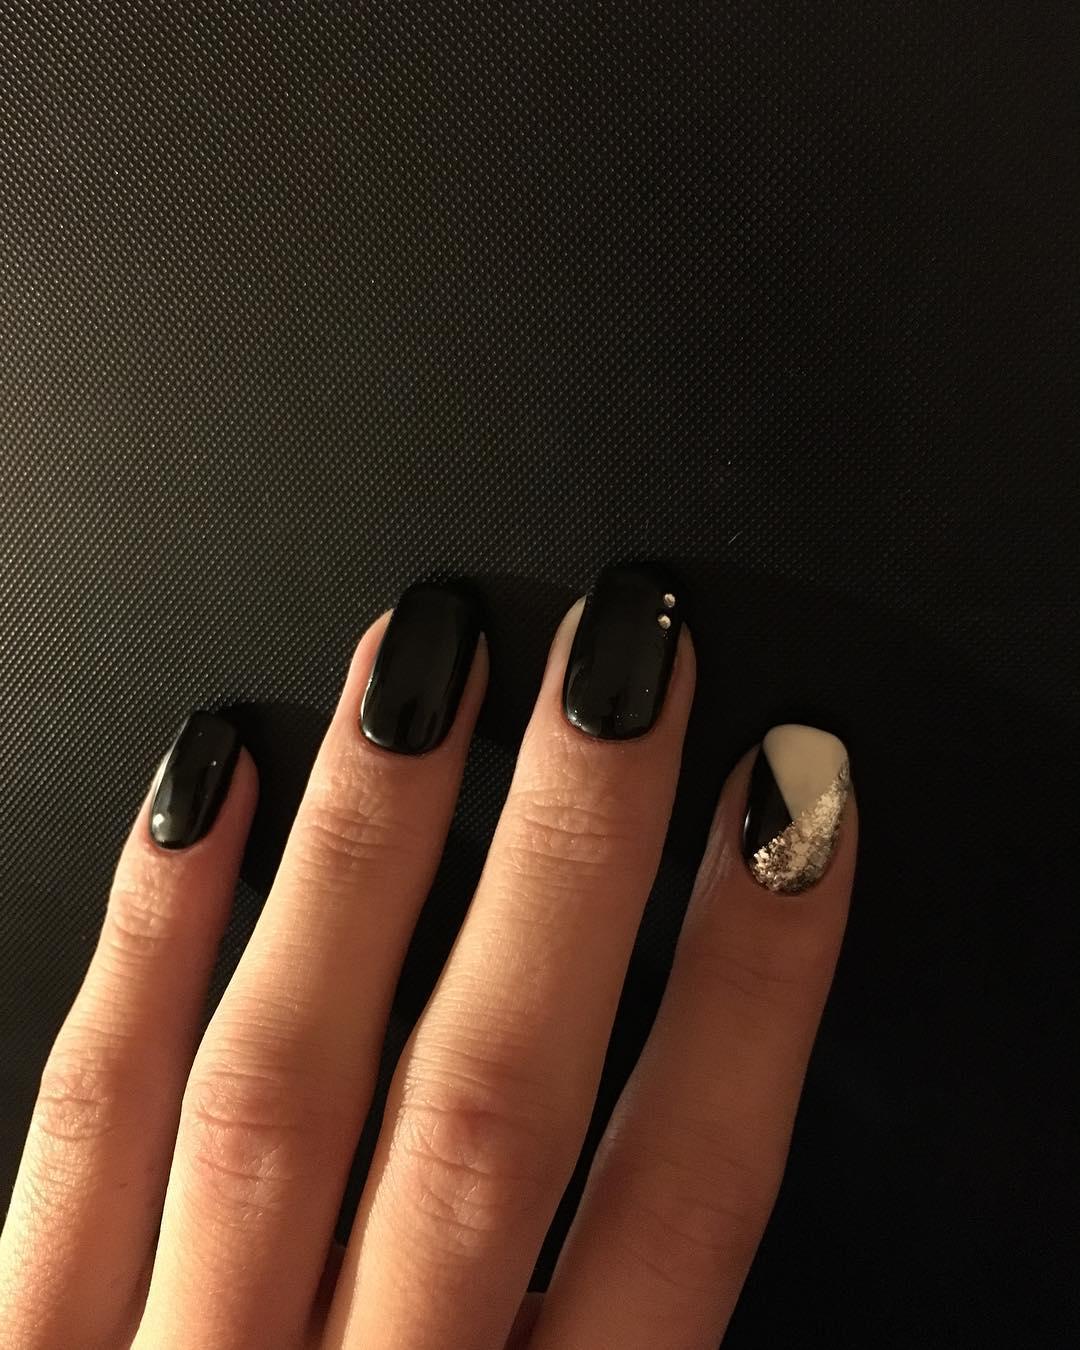 elegant black nail designs 2019 5 - Elegant Black Nail Designs 2019